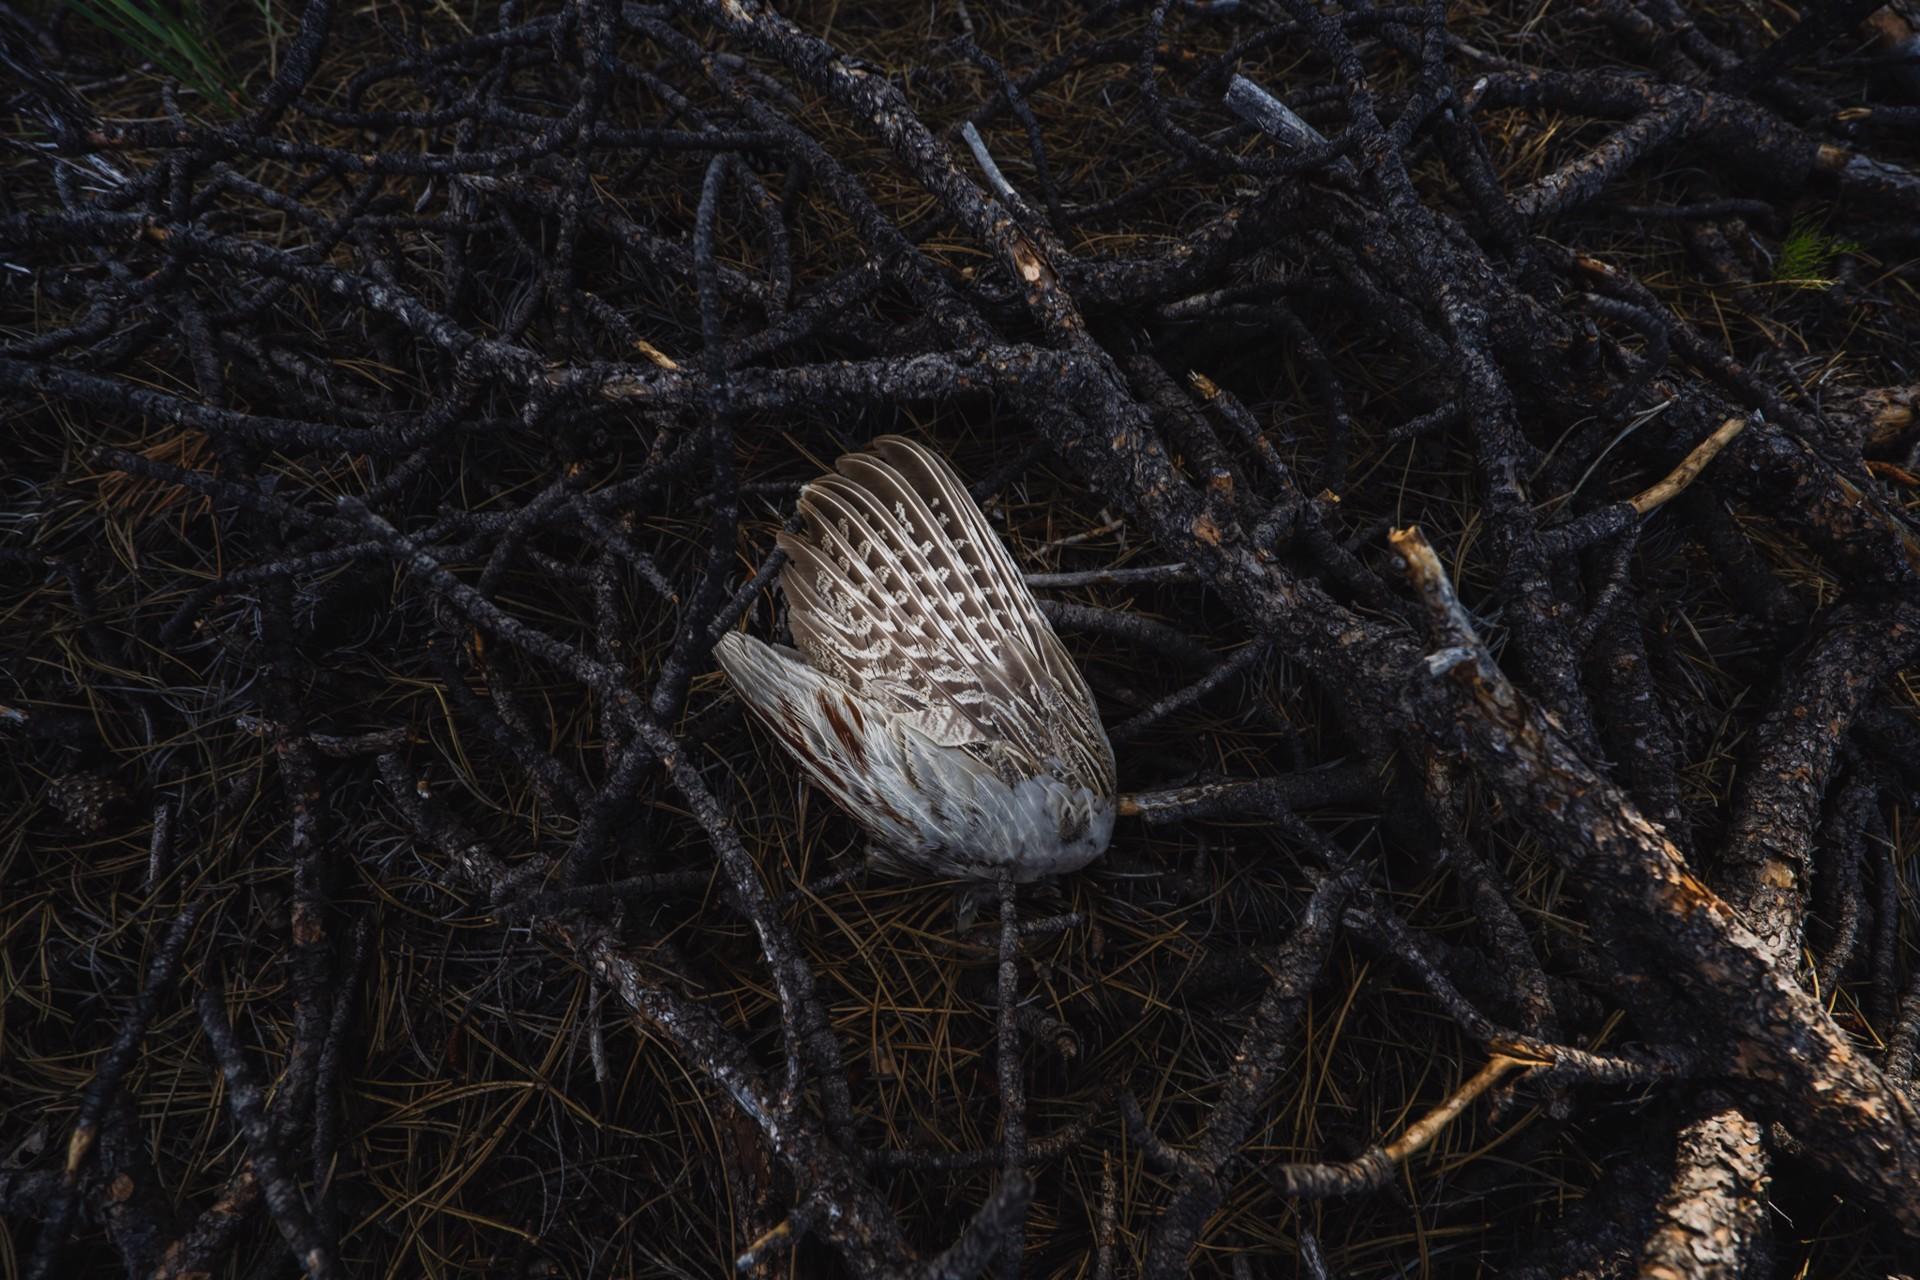 Nest II by Jenya Chernoff